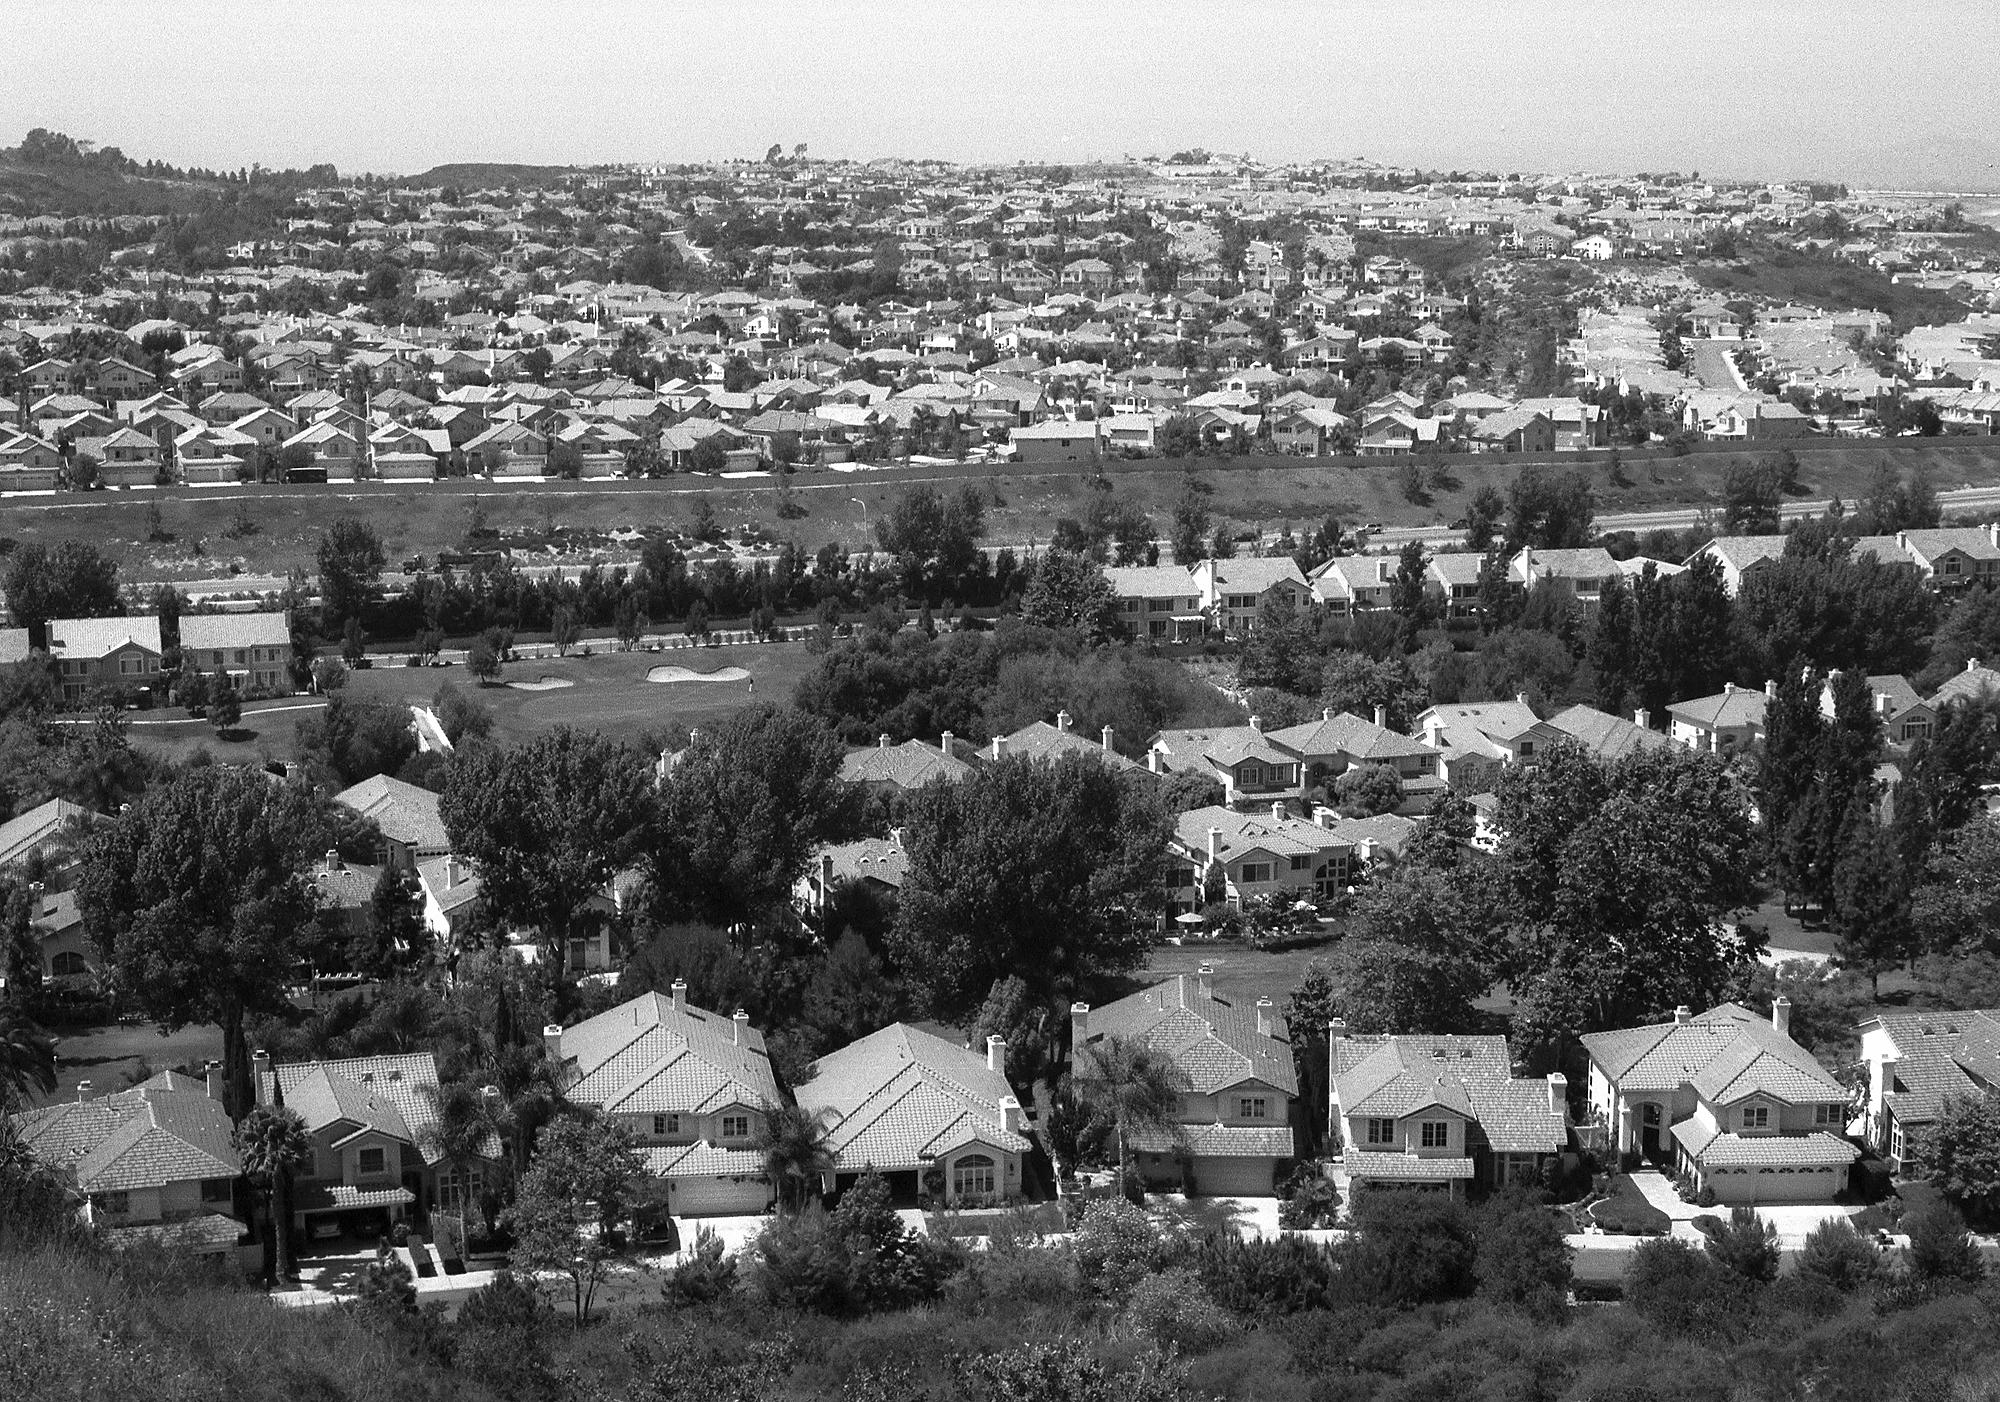 Carmel Valley, San Diego, California, 2002